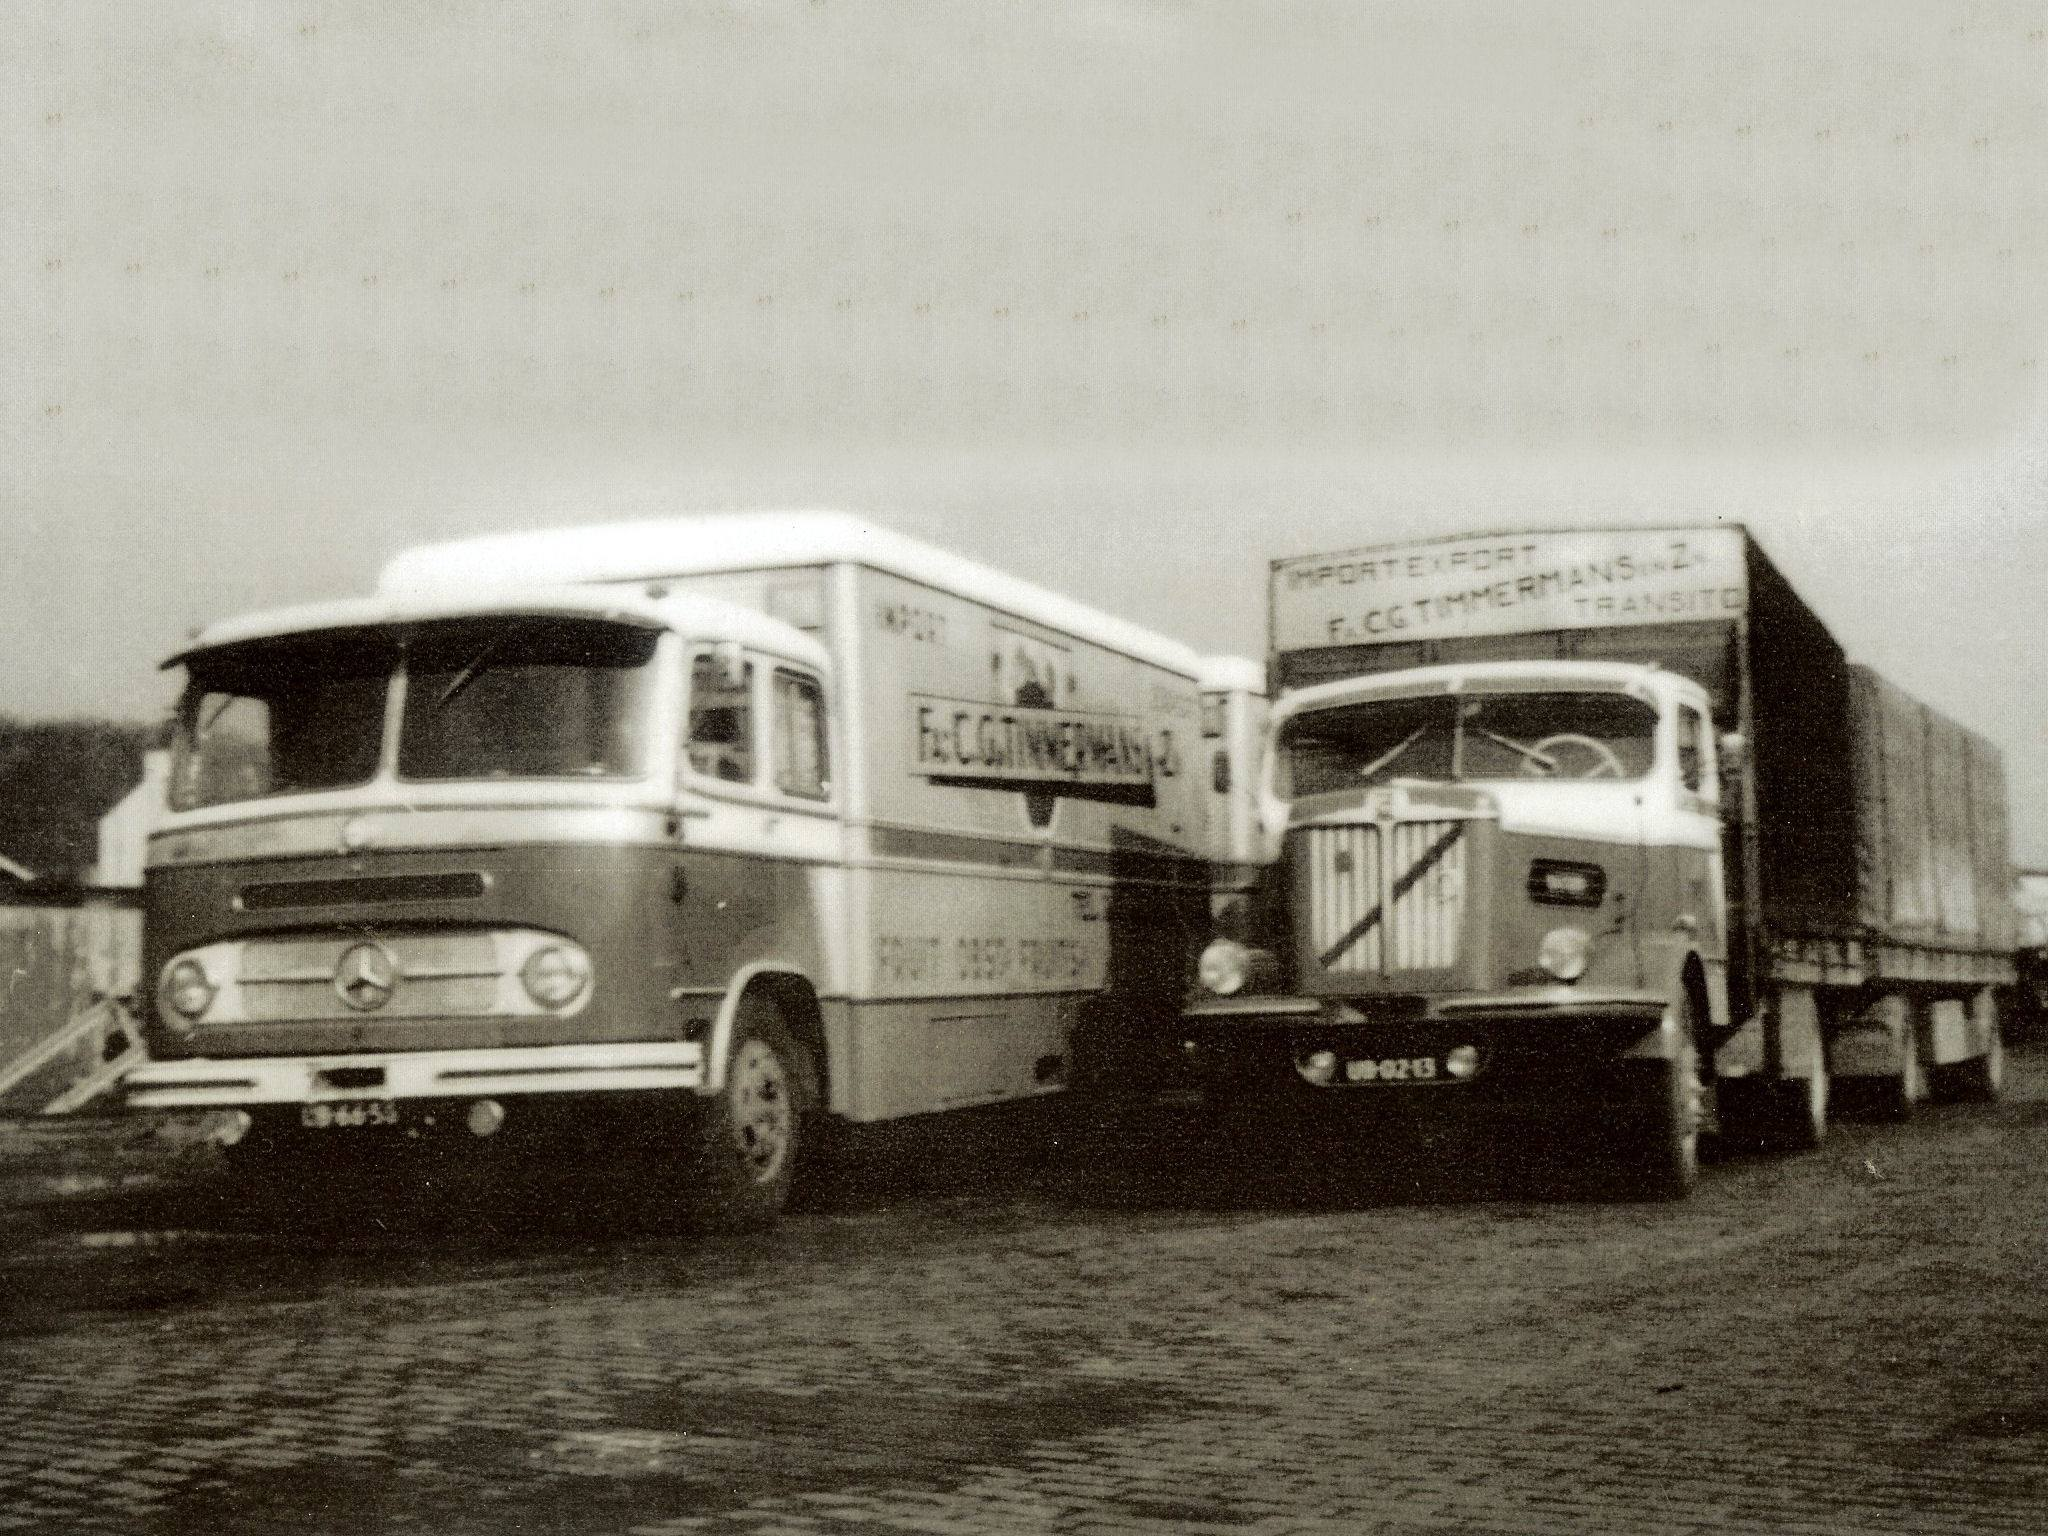 Timmermans-Transport-Veen-John-van-Andel-archief-5